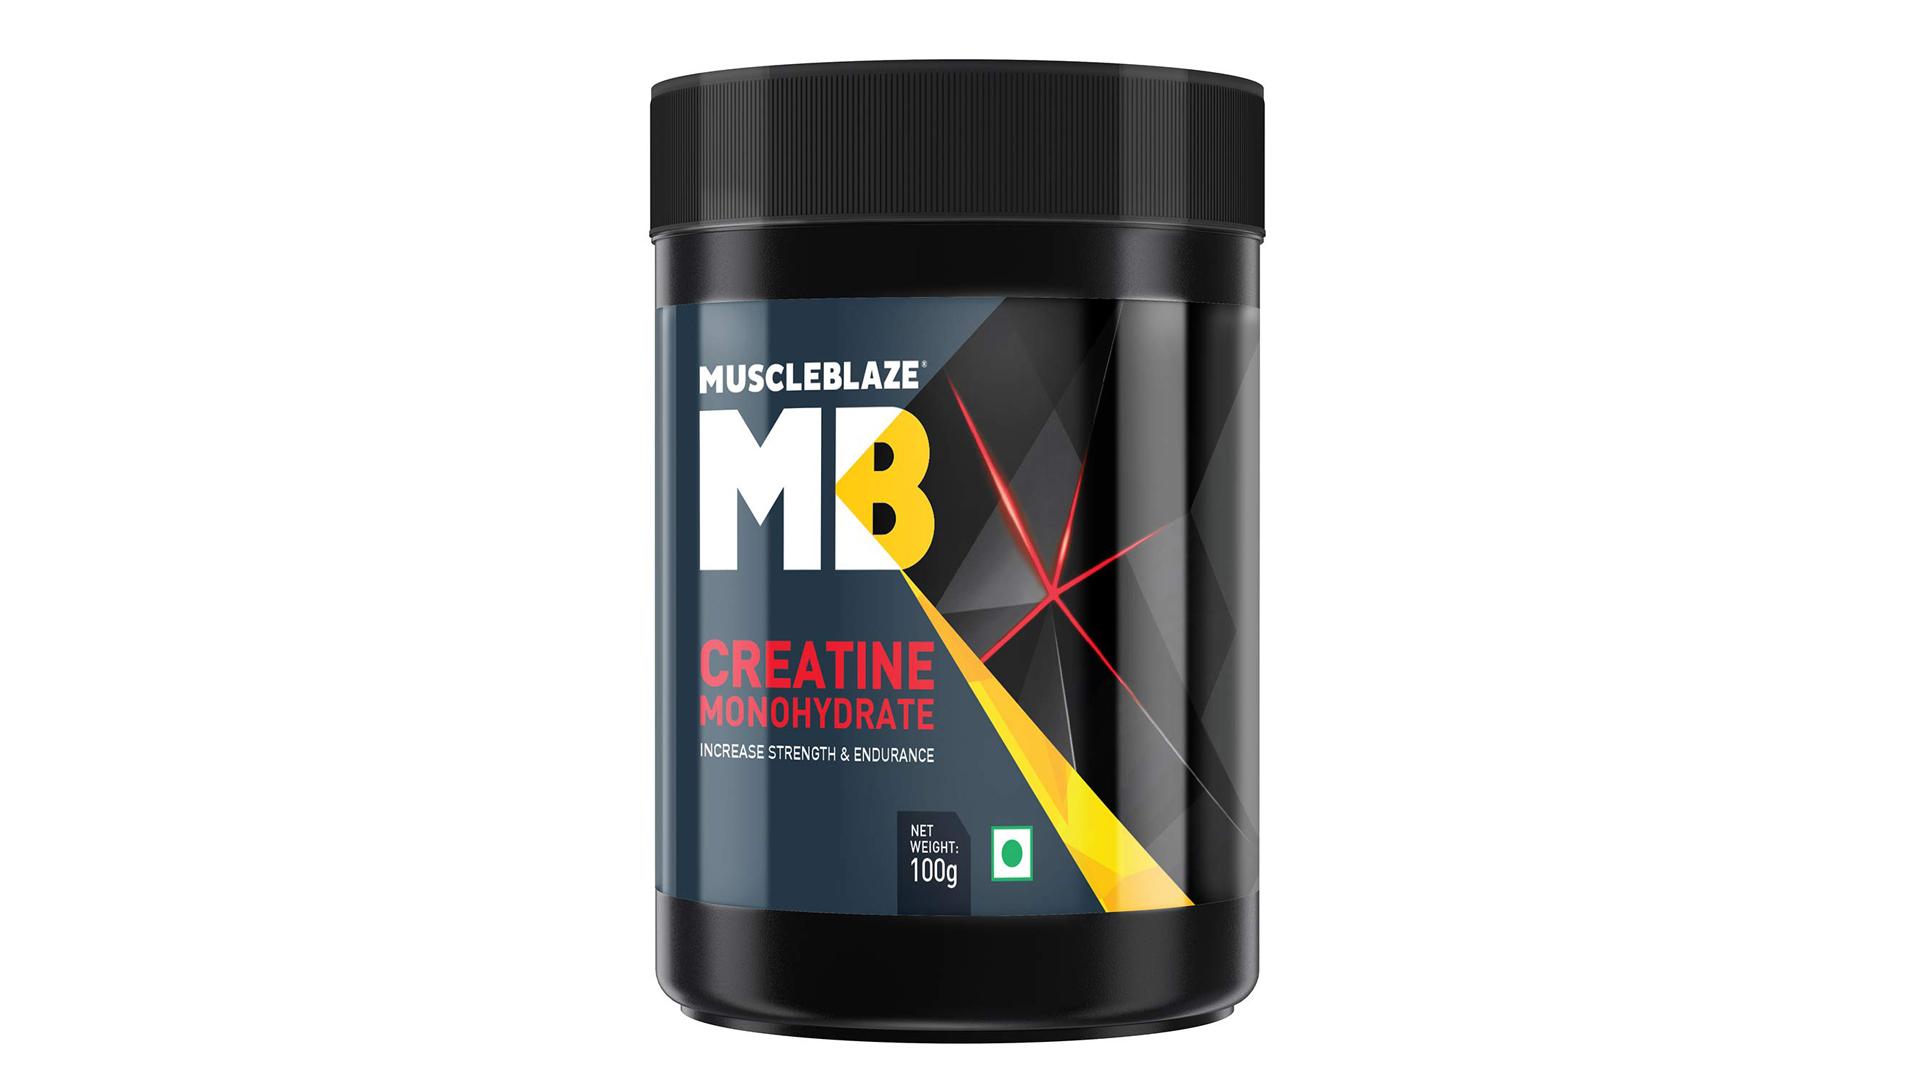 MuscleBlaze Creatine Supplement